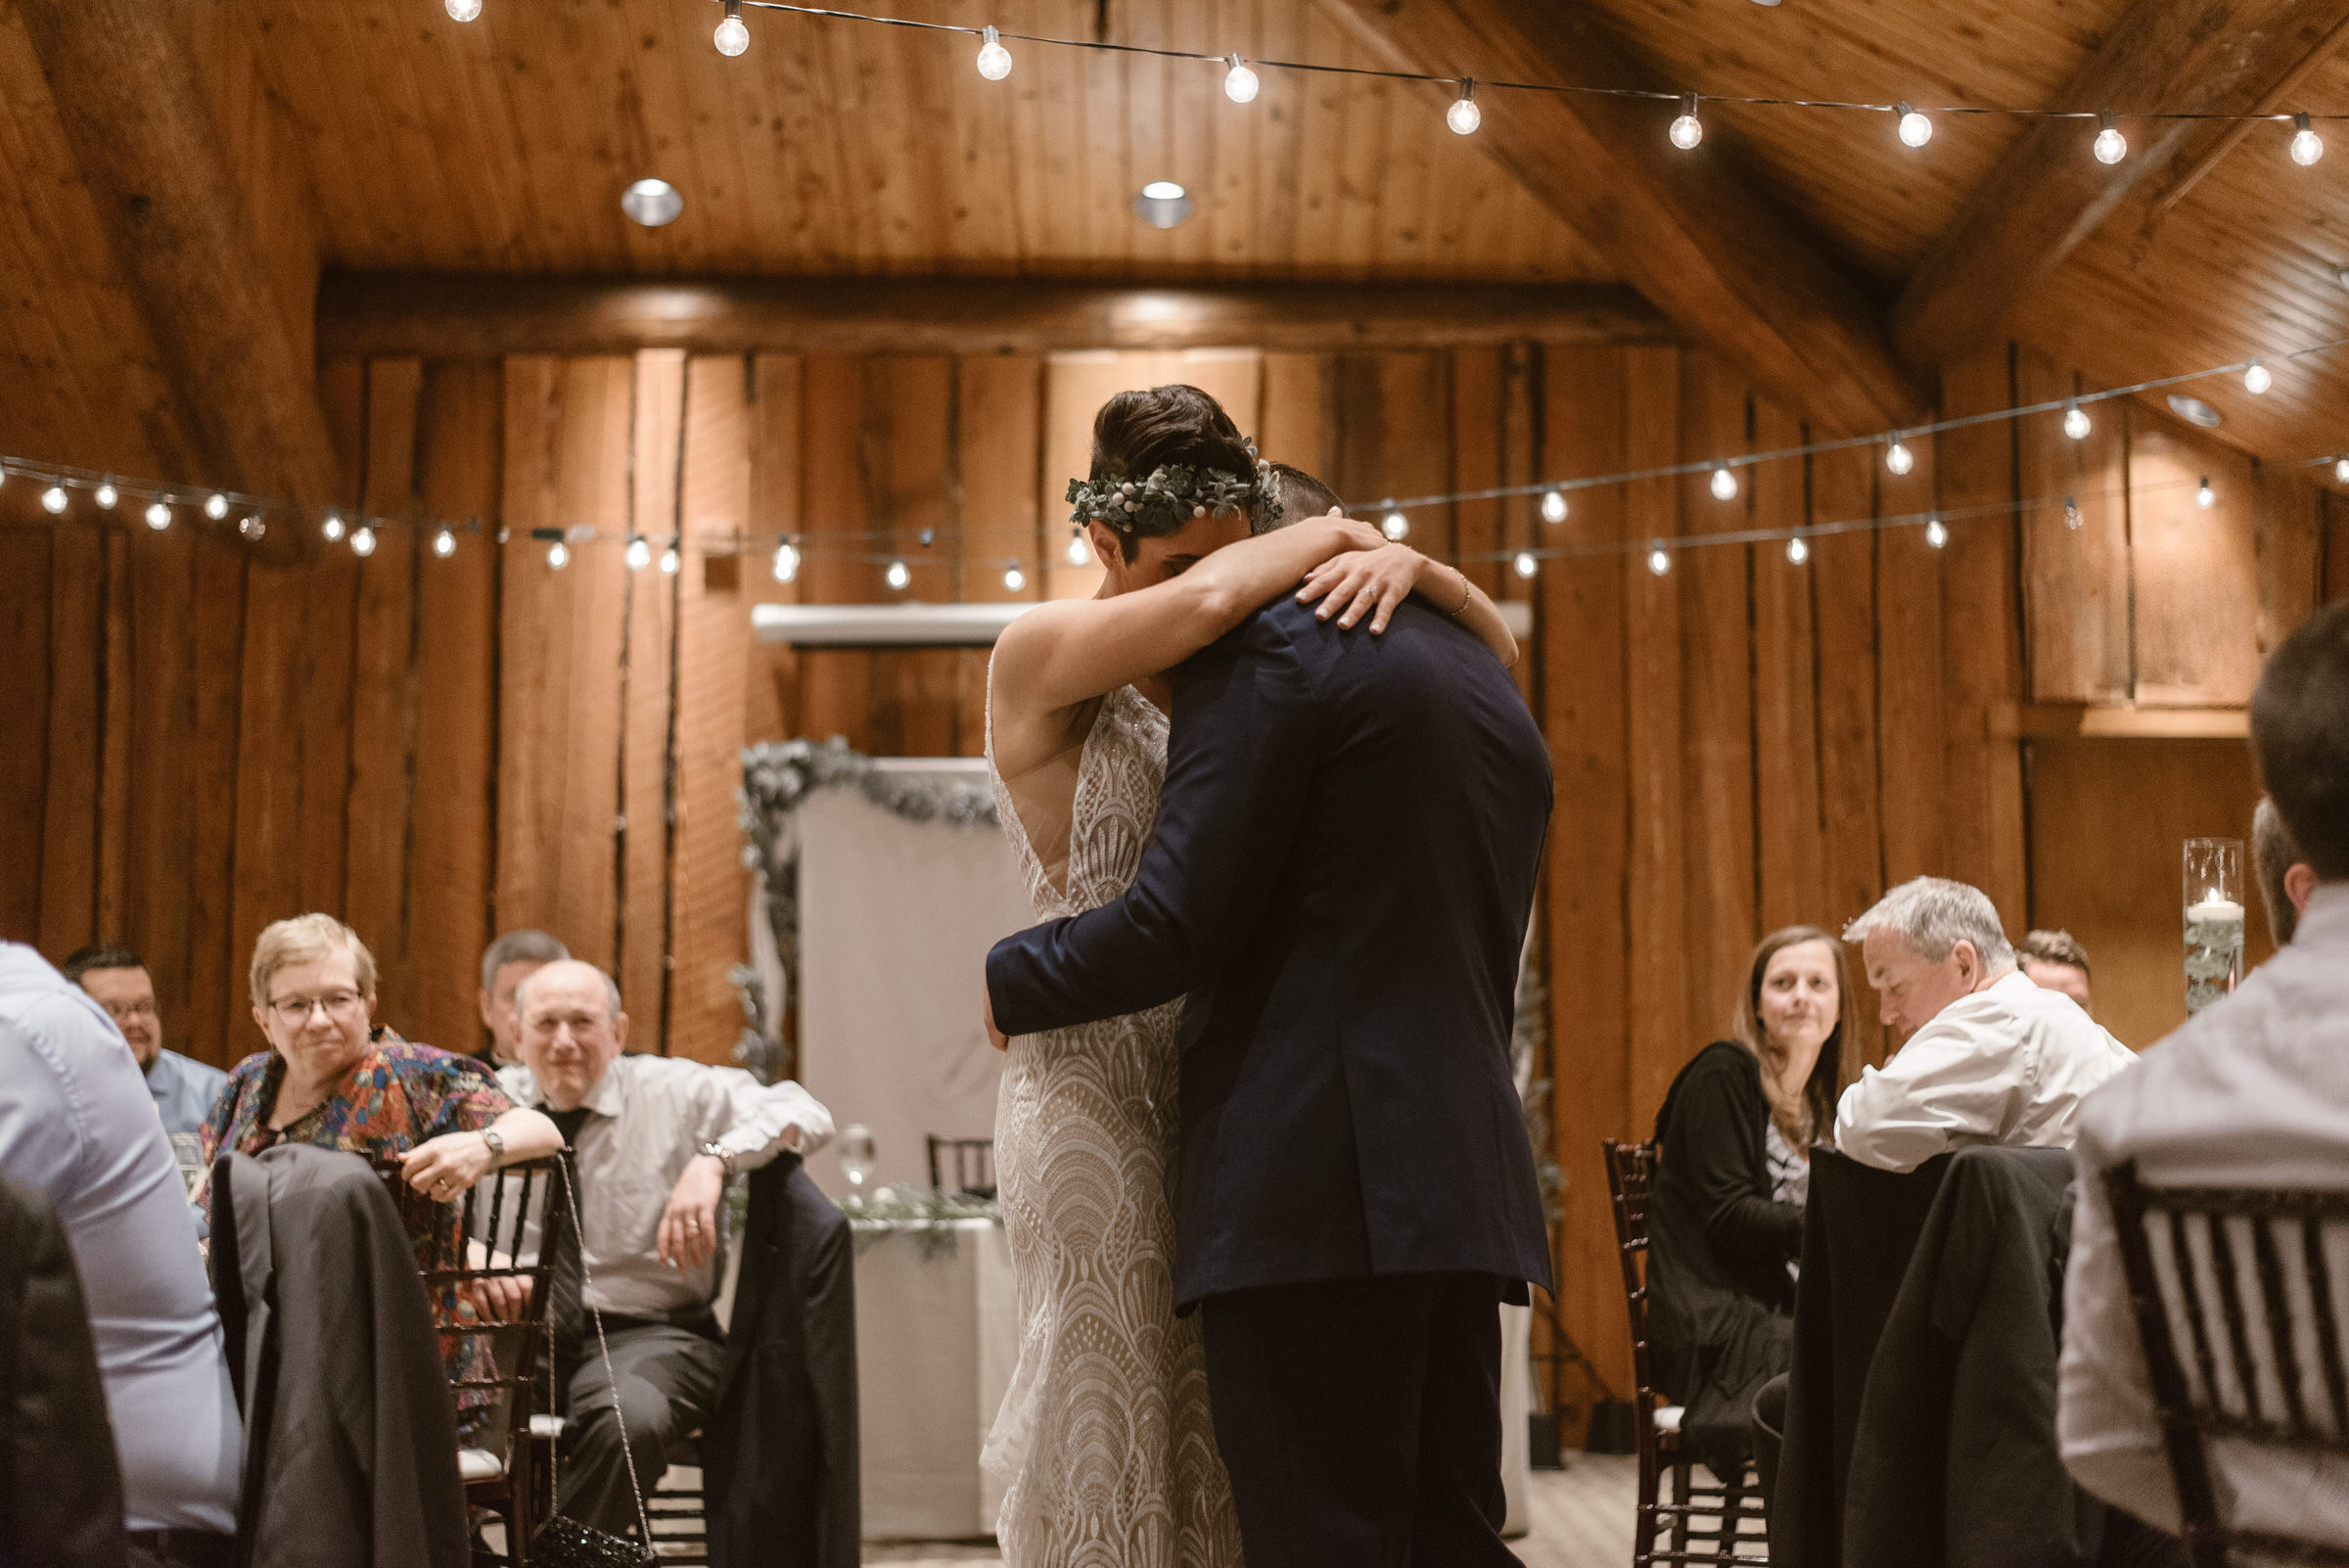 Wilderness-Ridge-Lincoln-Nebraska-Wedding-Kaylie-Sirek-Photography-096.jpg